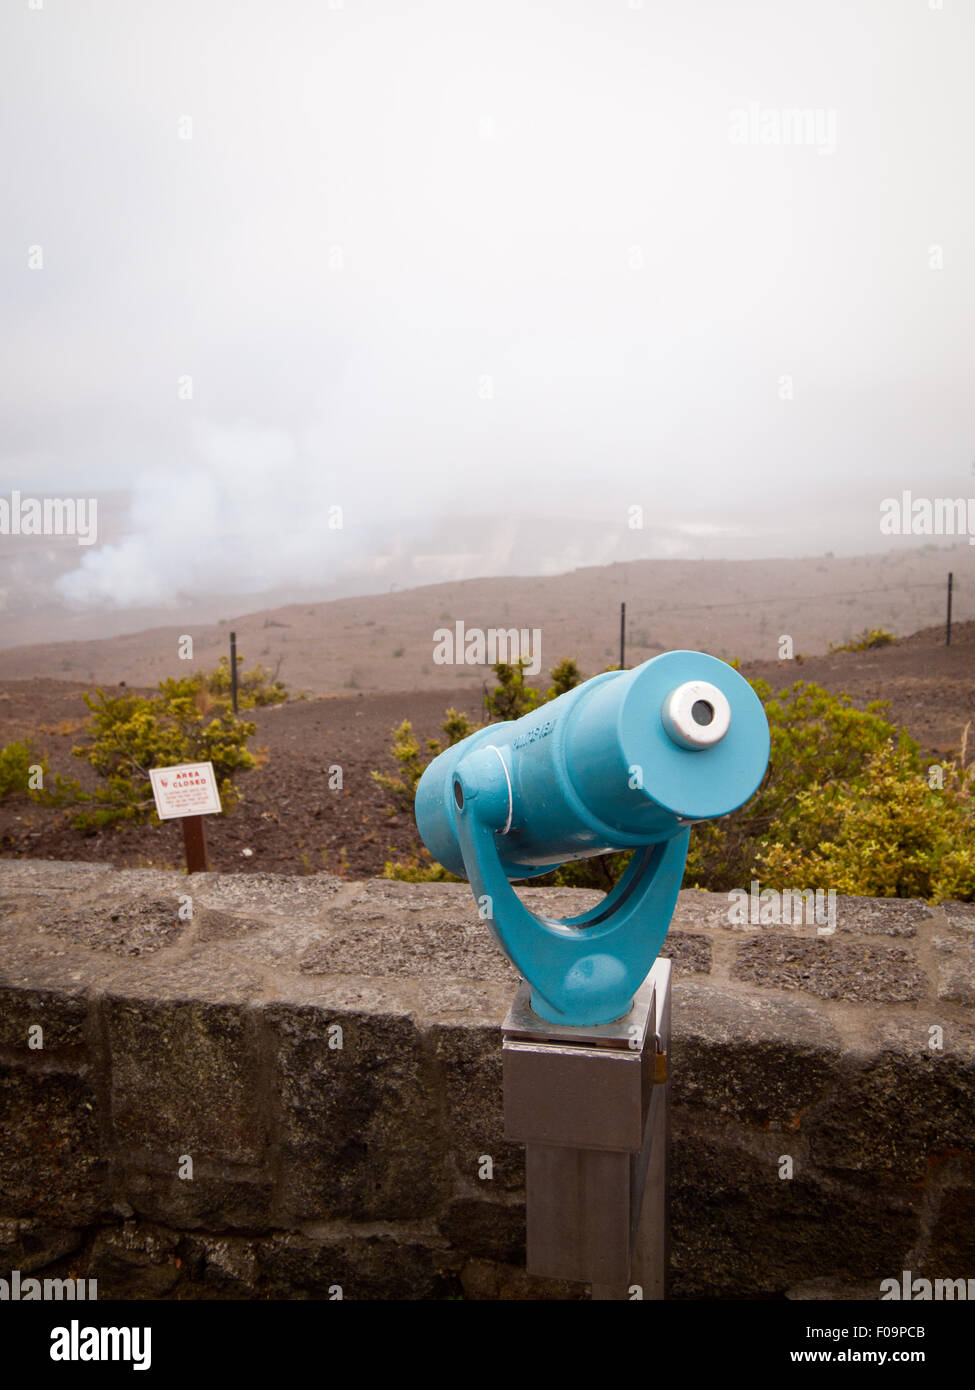 A turquoise blue viewfinder aimed at the centre of the Halema'uma'u Crater and Kilauea Caldera, Hawai'i - Stock Image